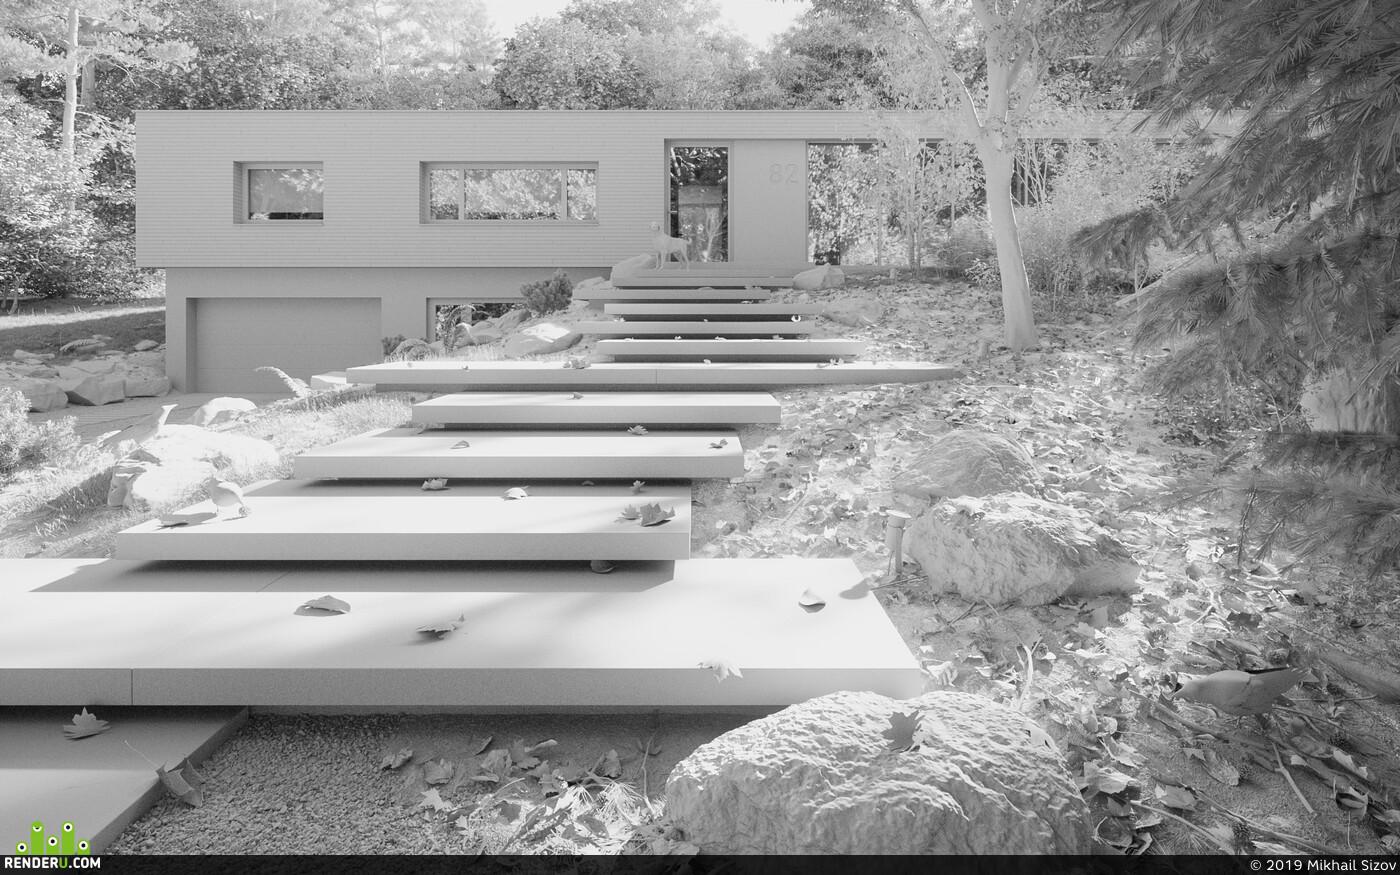 Exterior, 3d exterior, Exterior 3d visualization Corona Renderer corona 1.7 coronarenderer, bathhouse. bath of timber. glued beam. Exterior. 3D visualization. architectural visualization. Visualization.